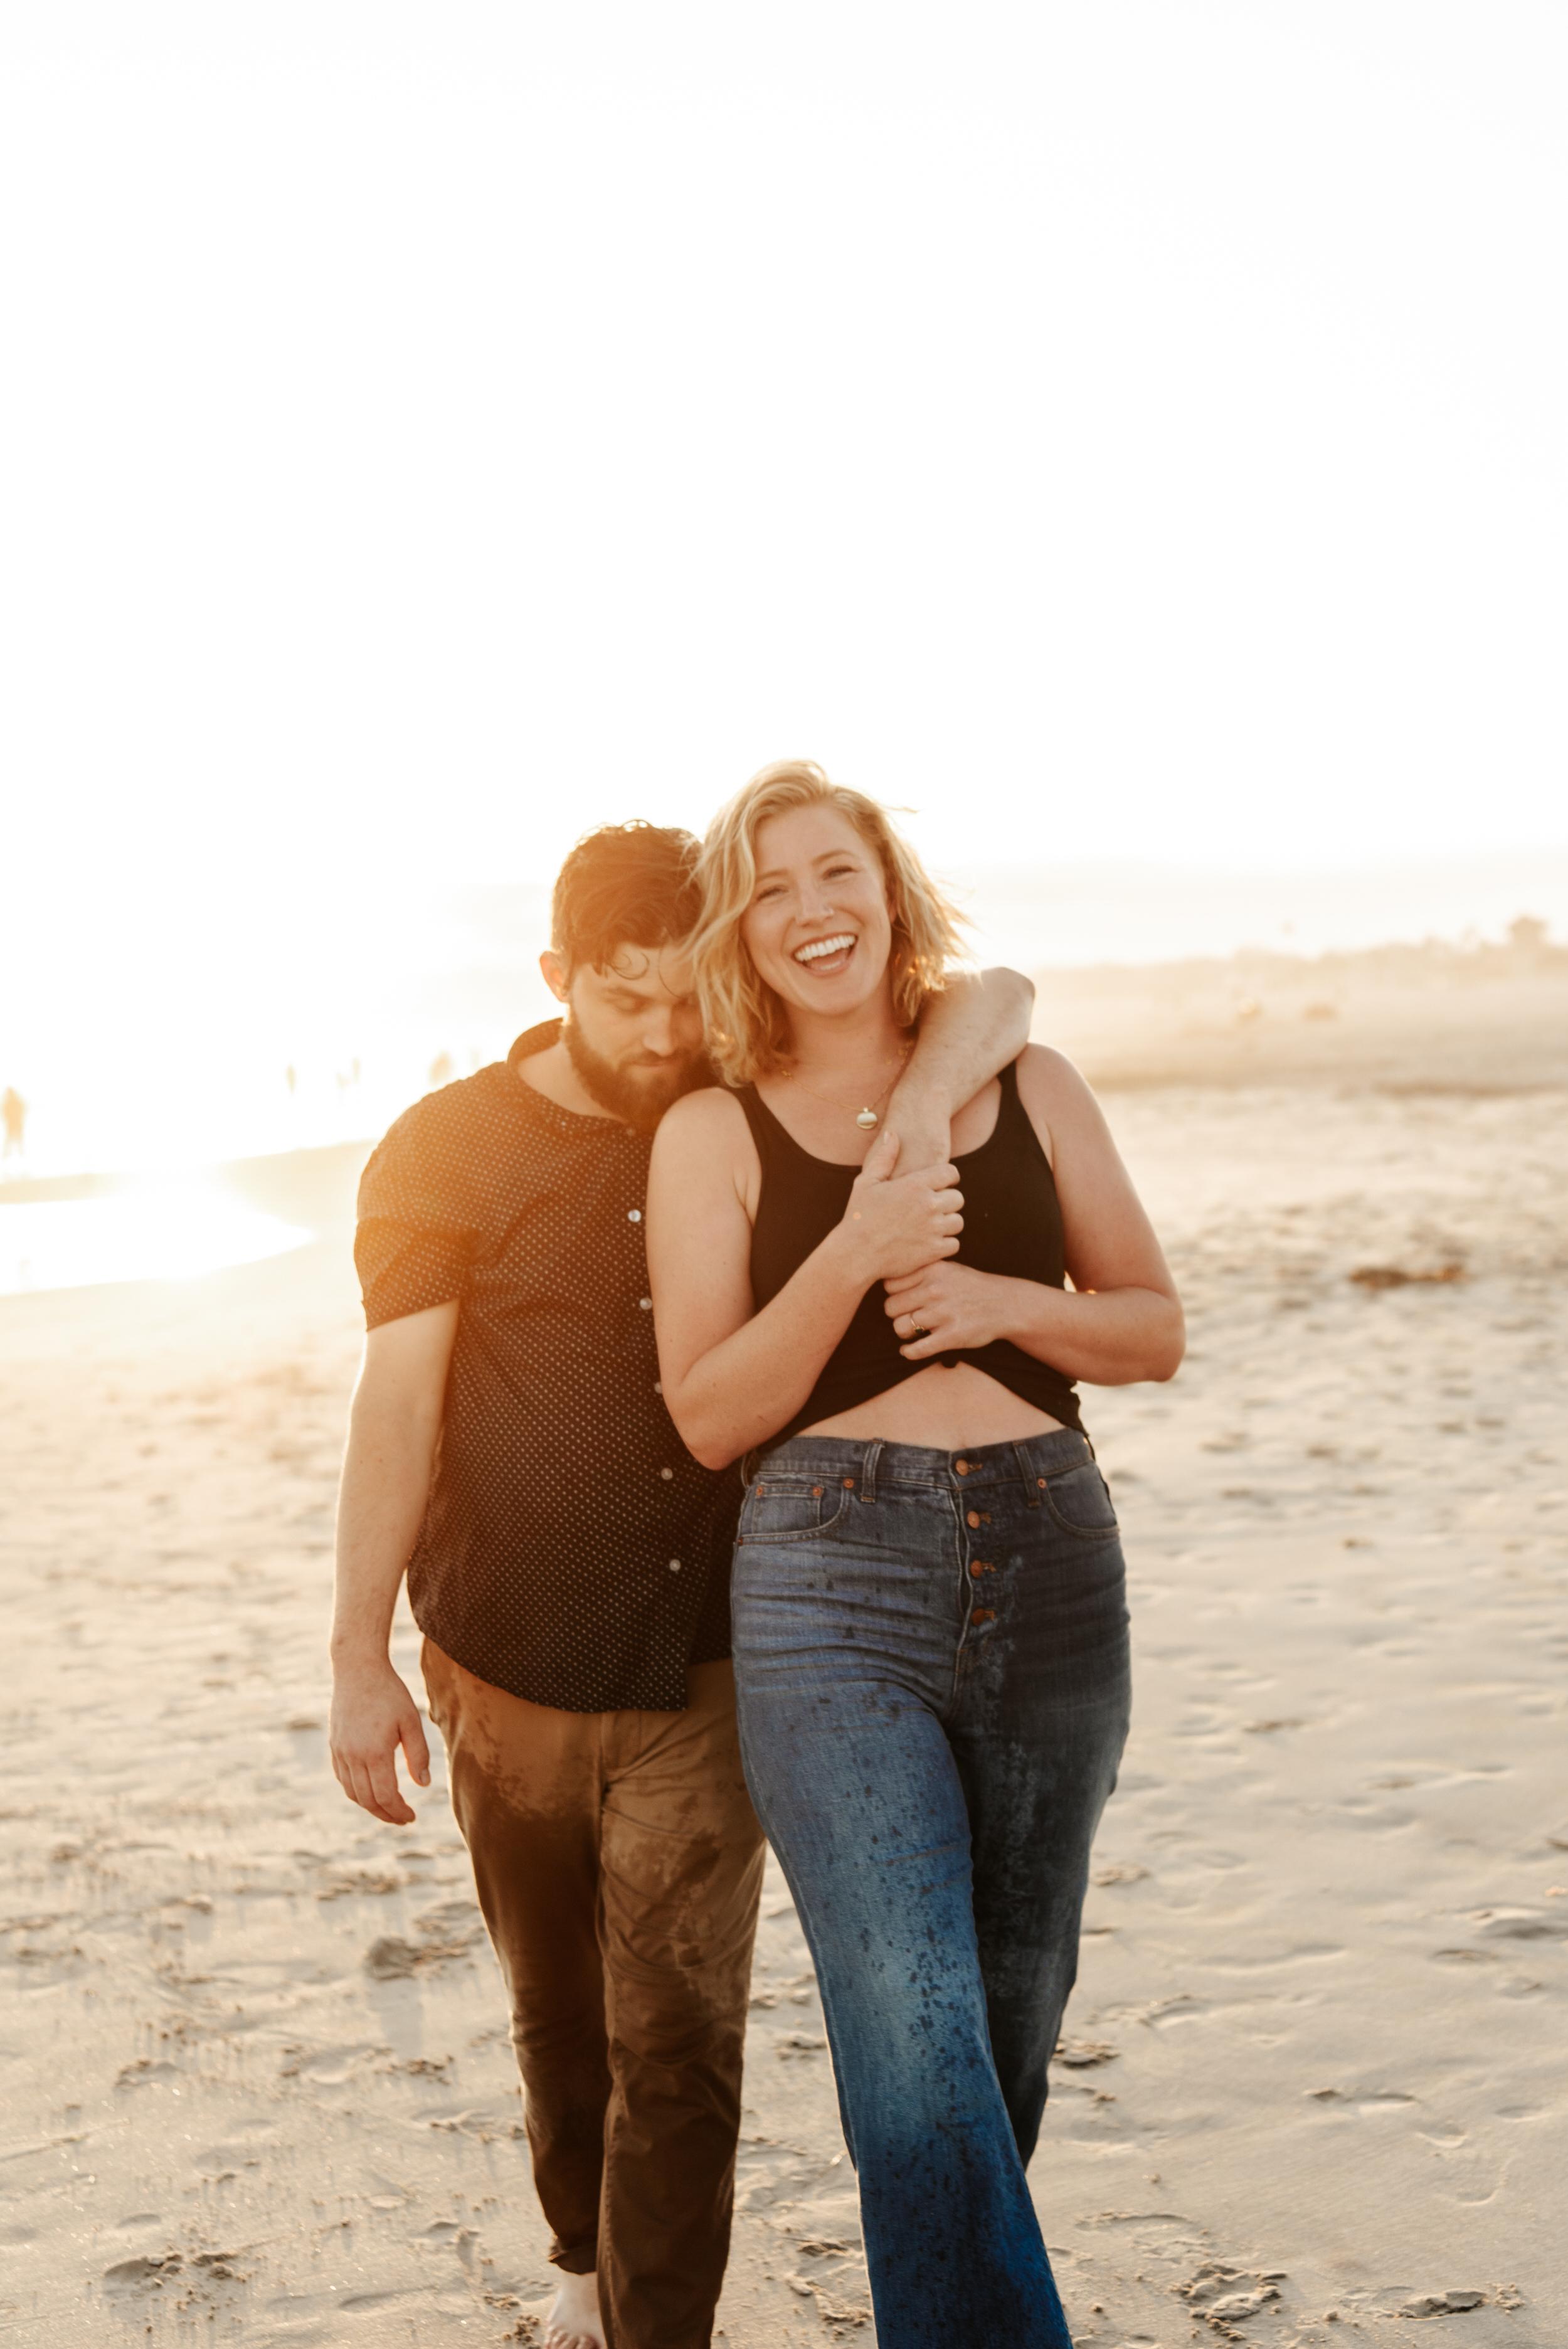 SoCal Standard - San Diego Engagement Photographer - Beach Bonfire at the Hotel Del Coronado-18.jpg